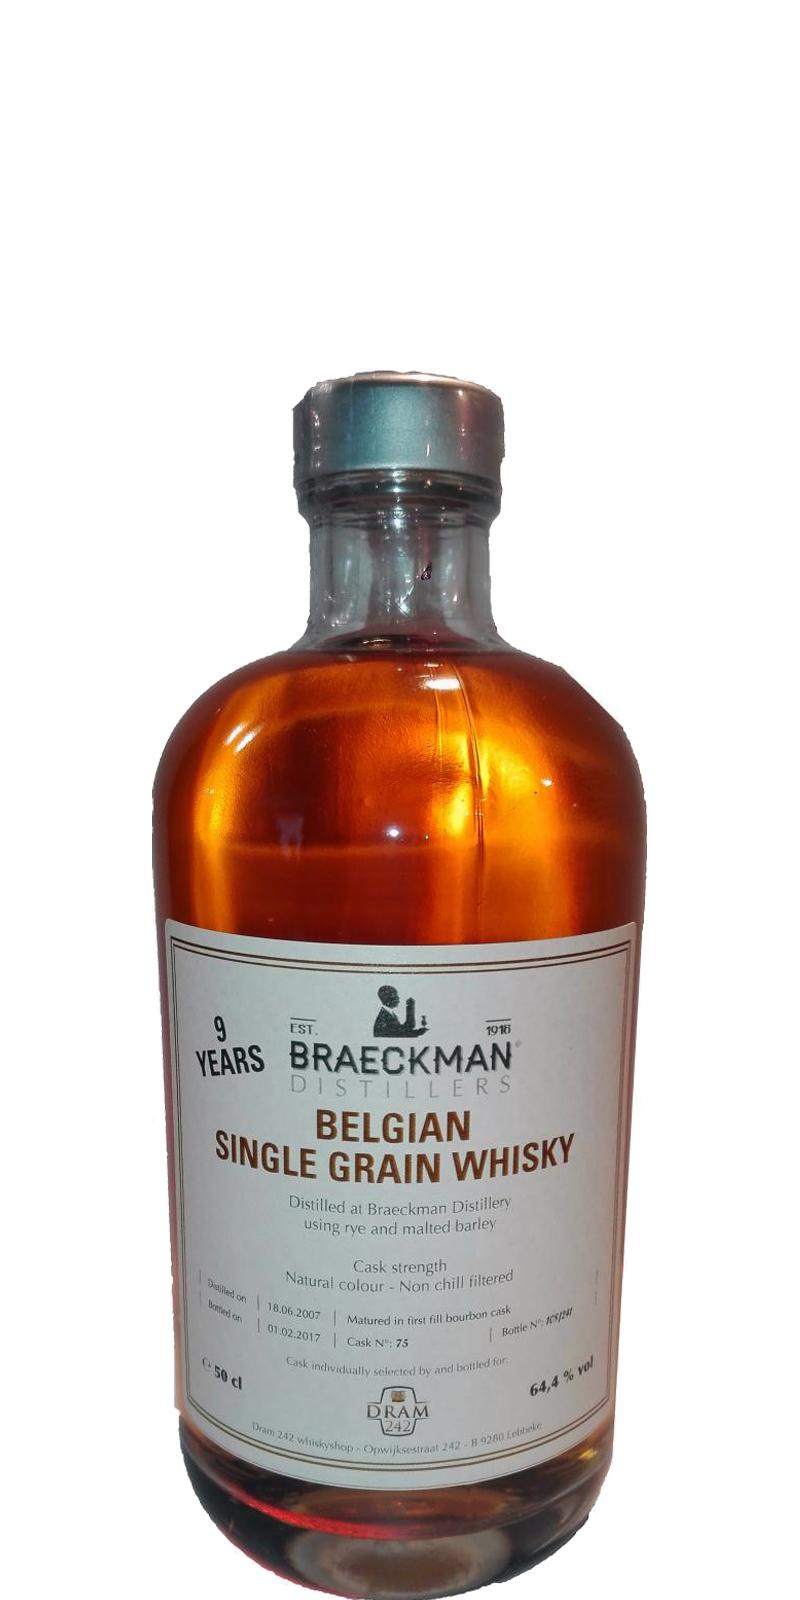 Braeckman Distillers 2007